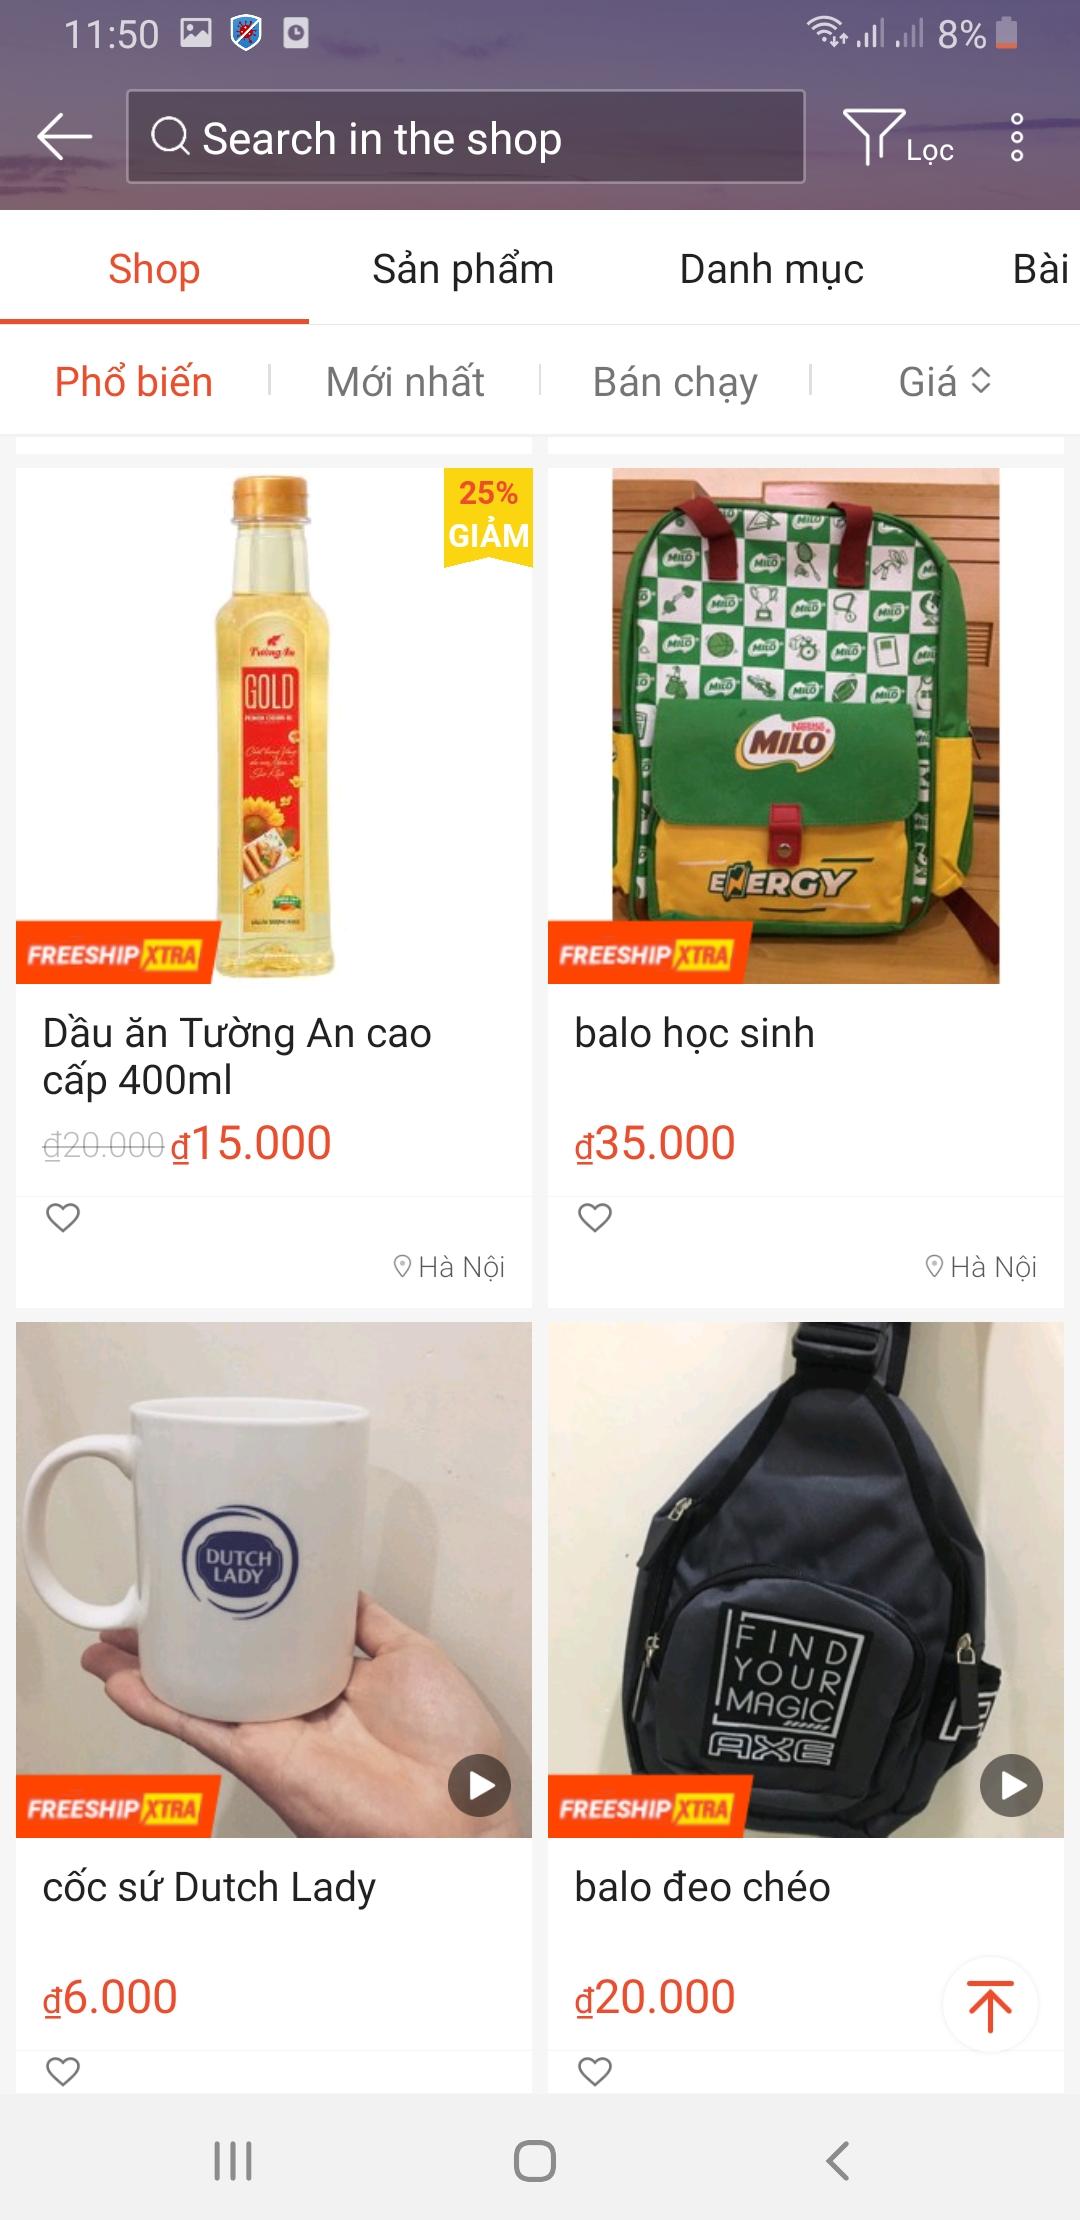 Screenshot_20200813-115028_Shopee.jpg